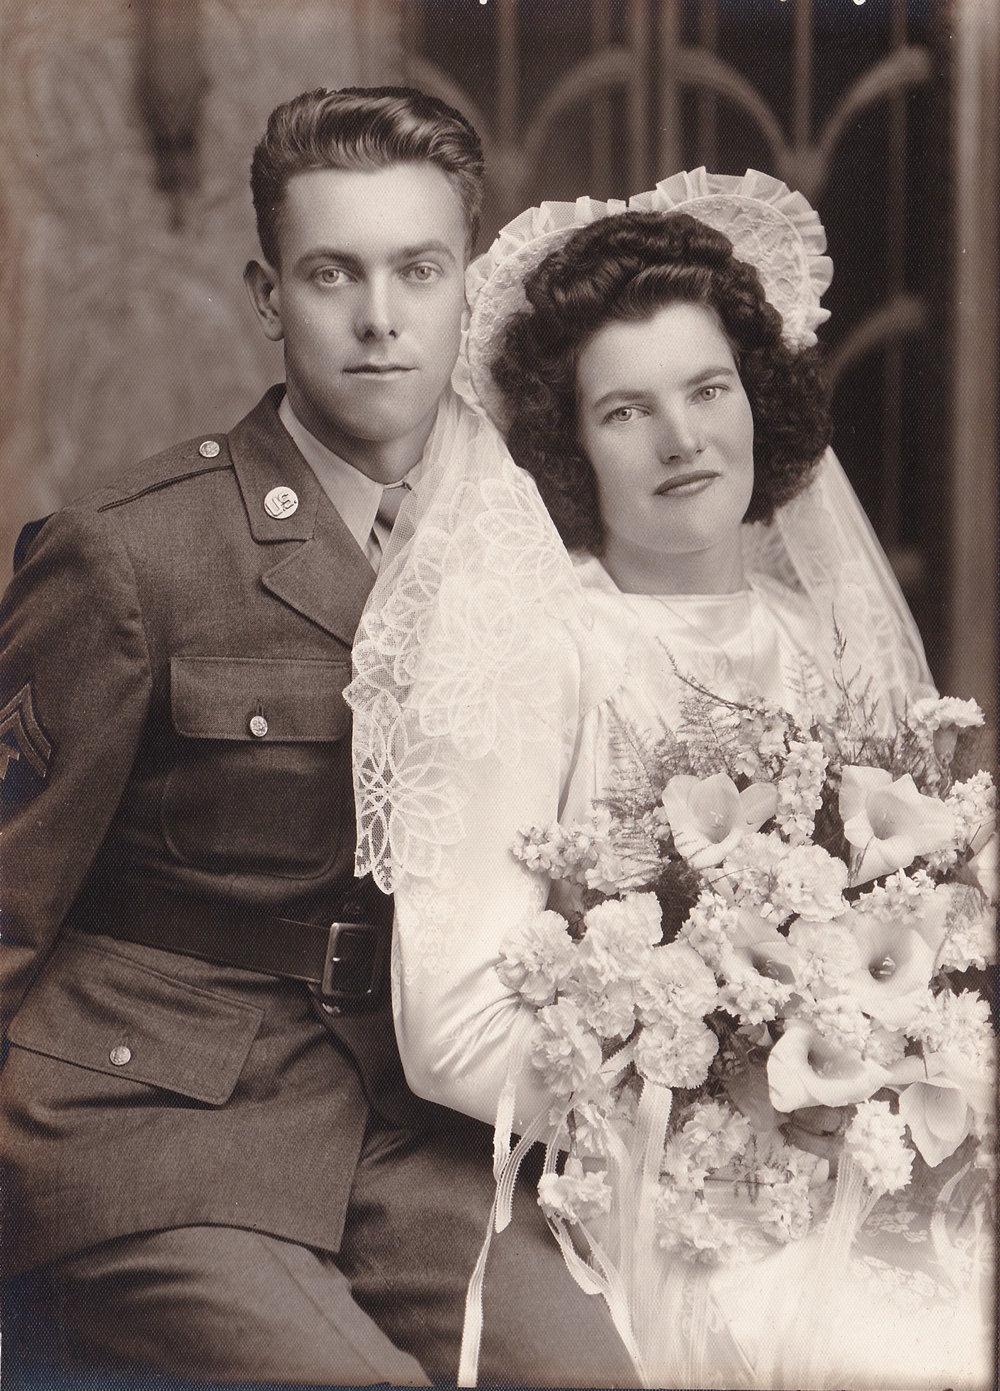 In loving memory of my grandparents.